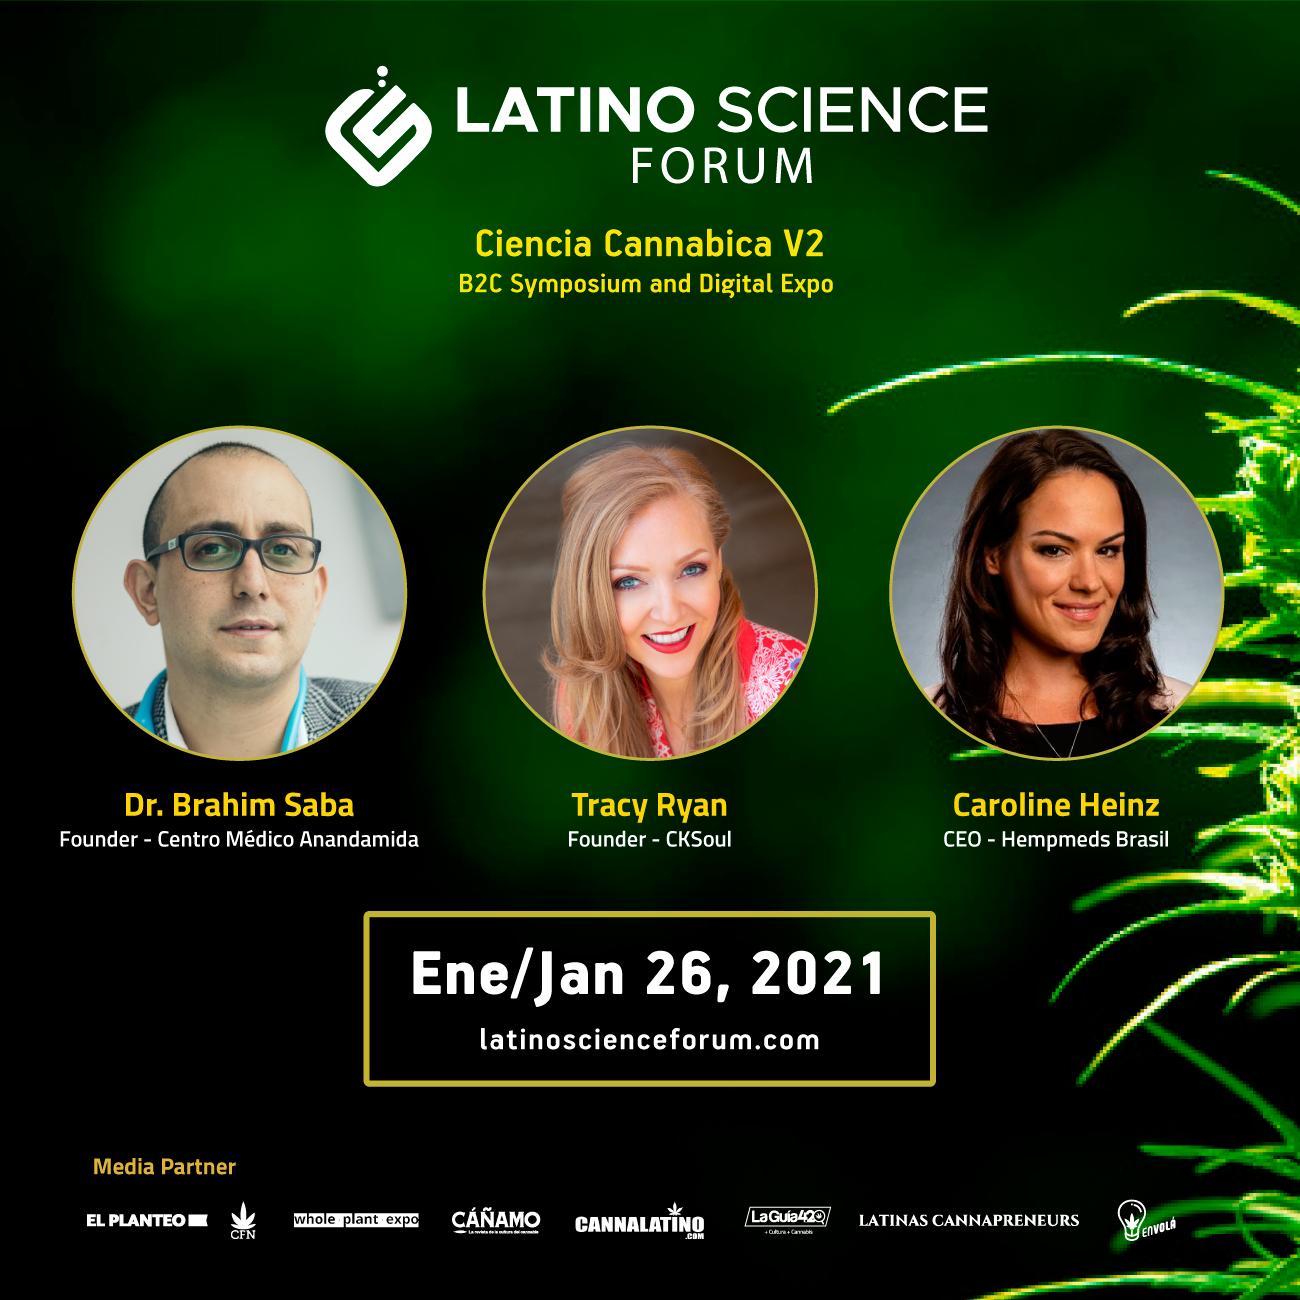 Latino Science Forum 2021 - Ciencia Cannabica - B2C Symposium